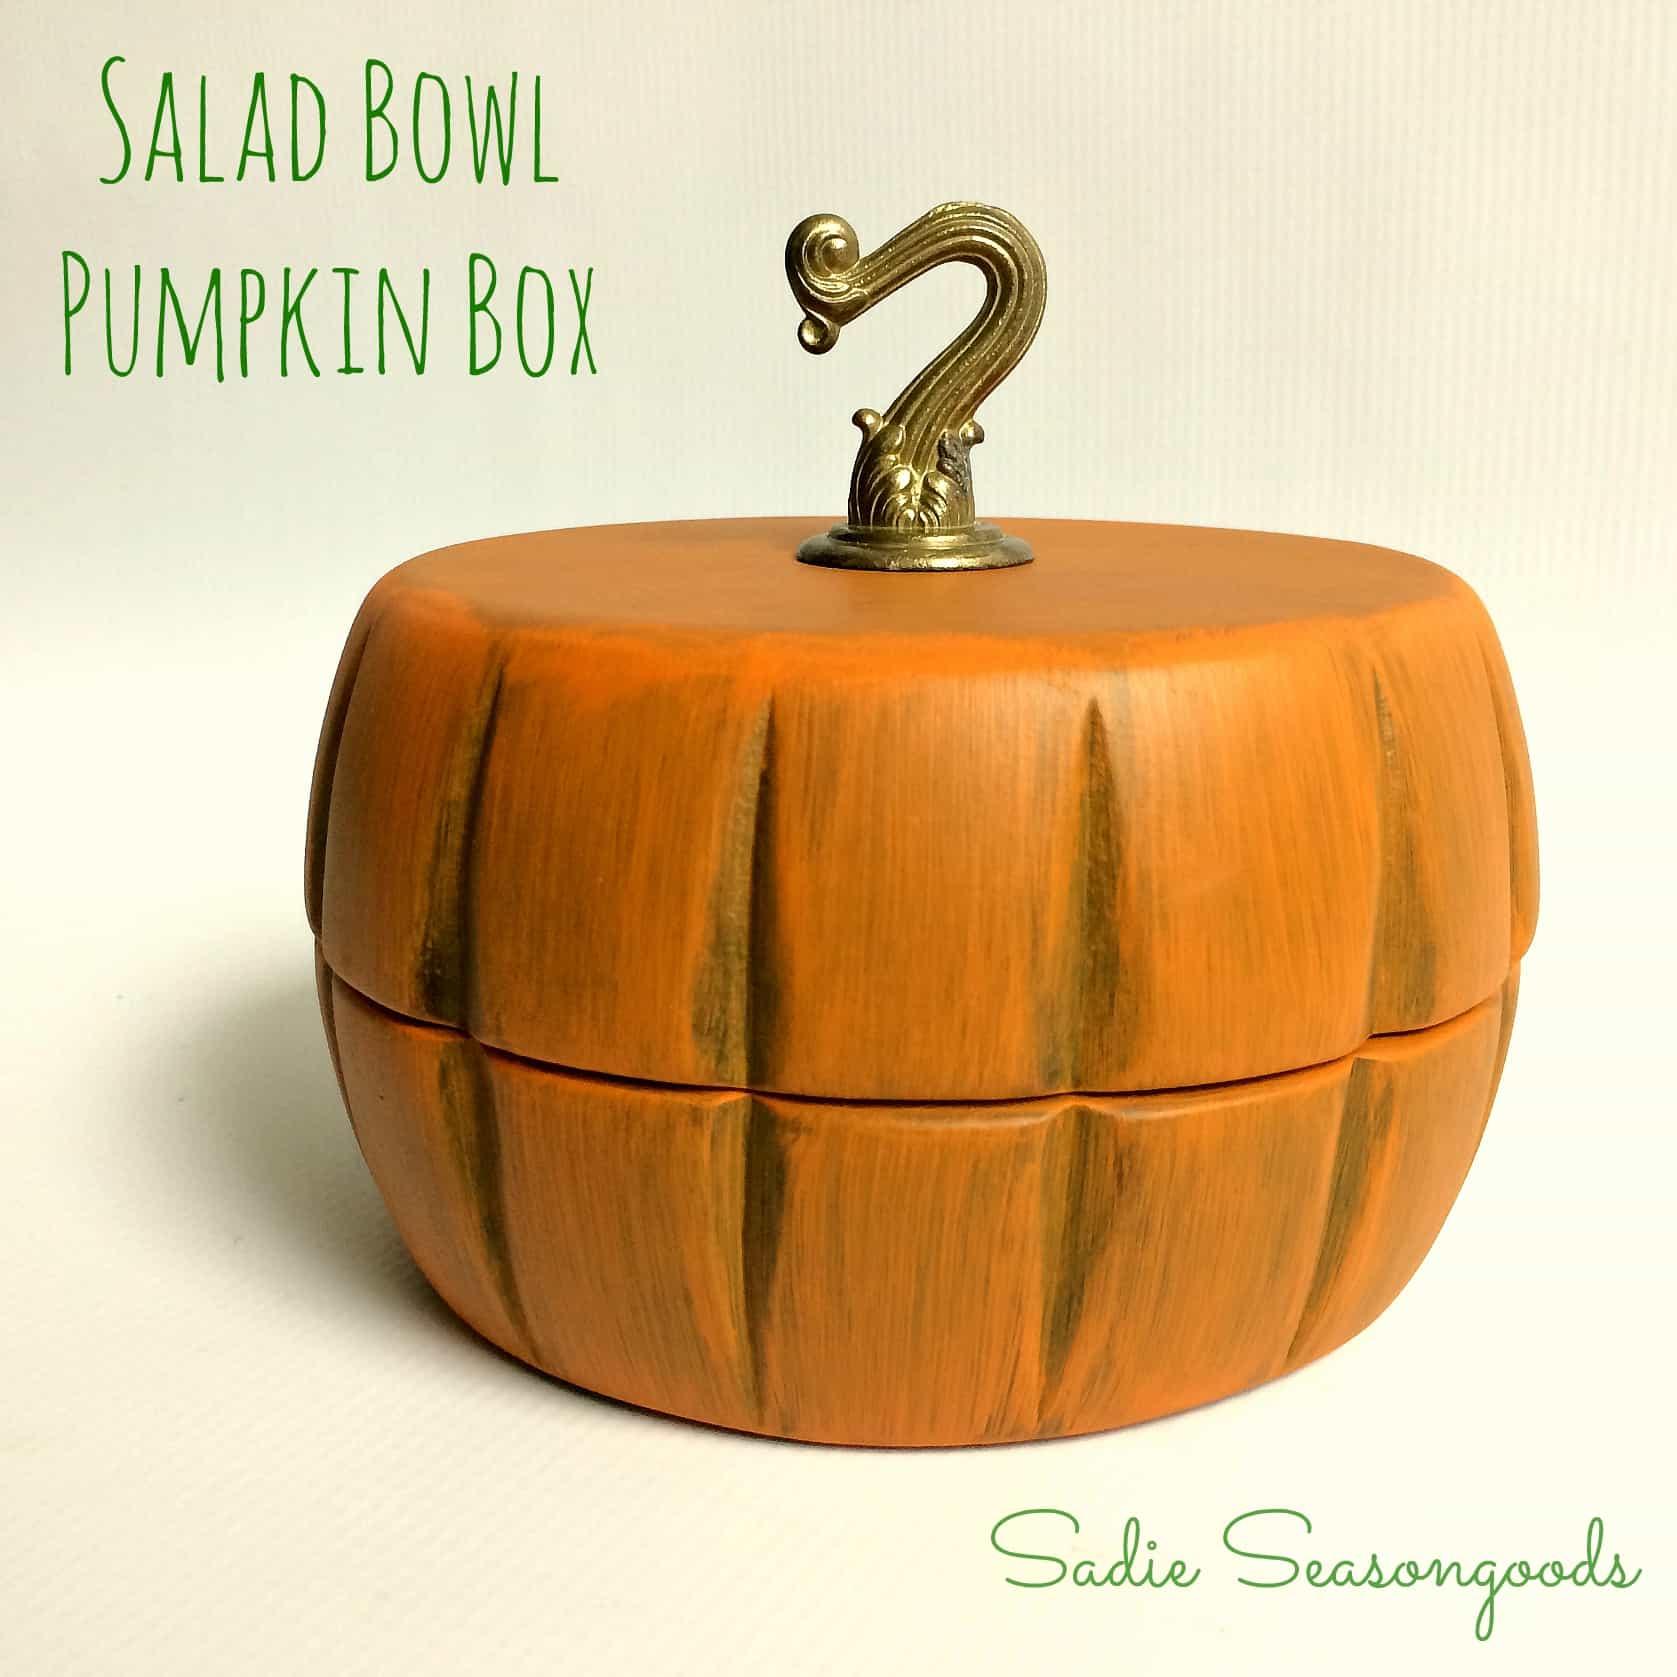 Sadie_Seasongoods_thrifted_wooden_salad_bowls_Pumpkin_trinket_box_for_Fall_Autumn_Decor